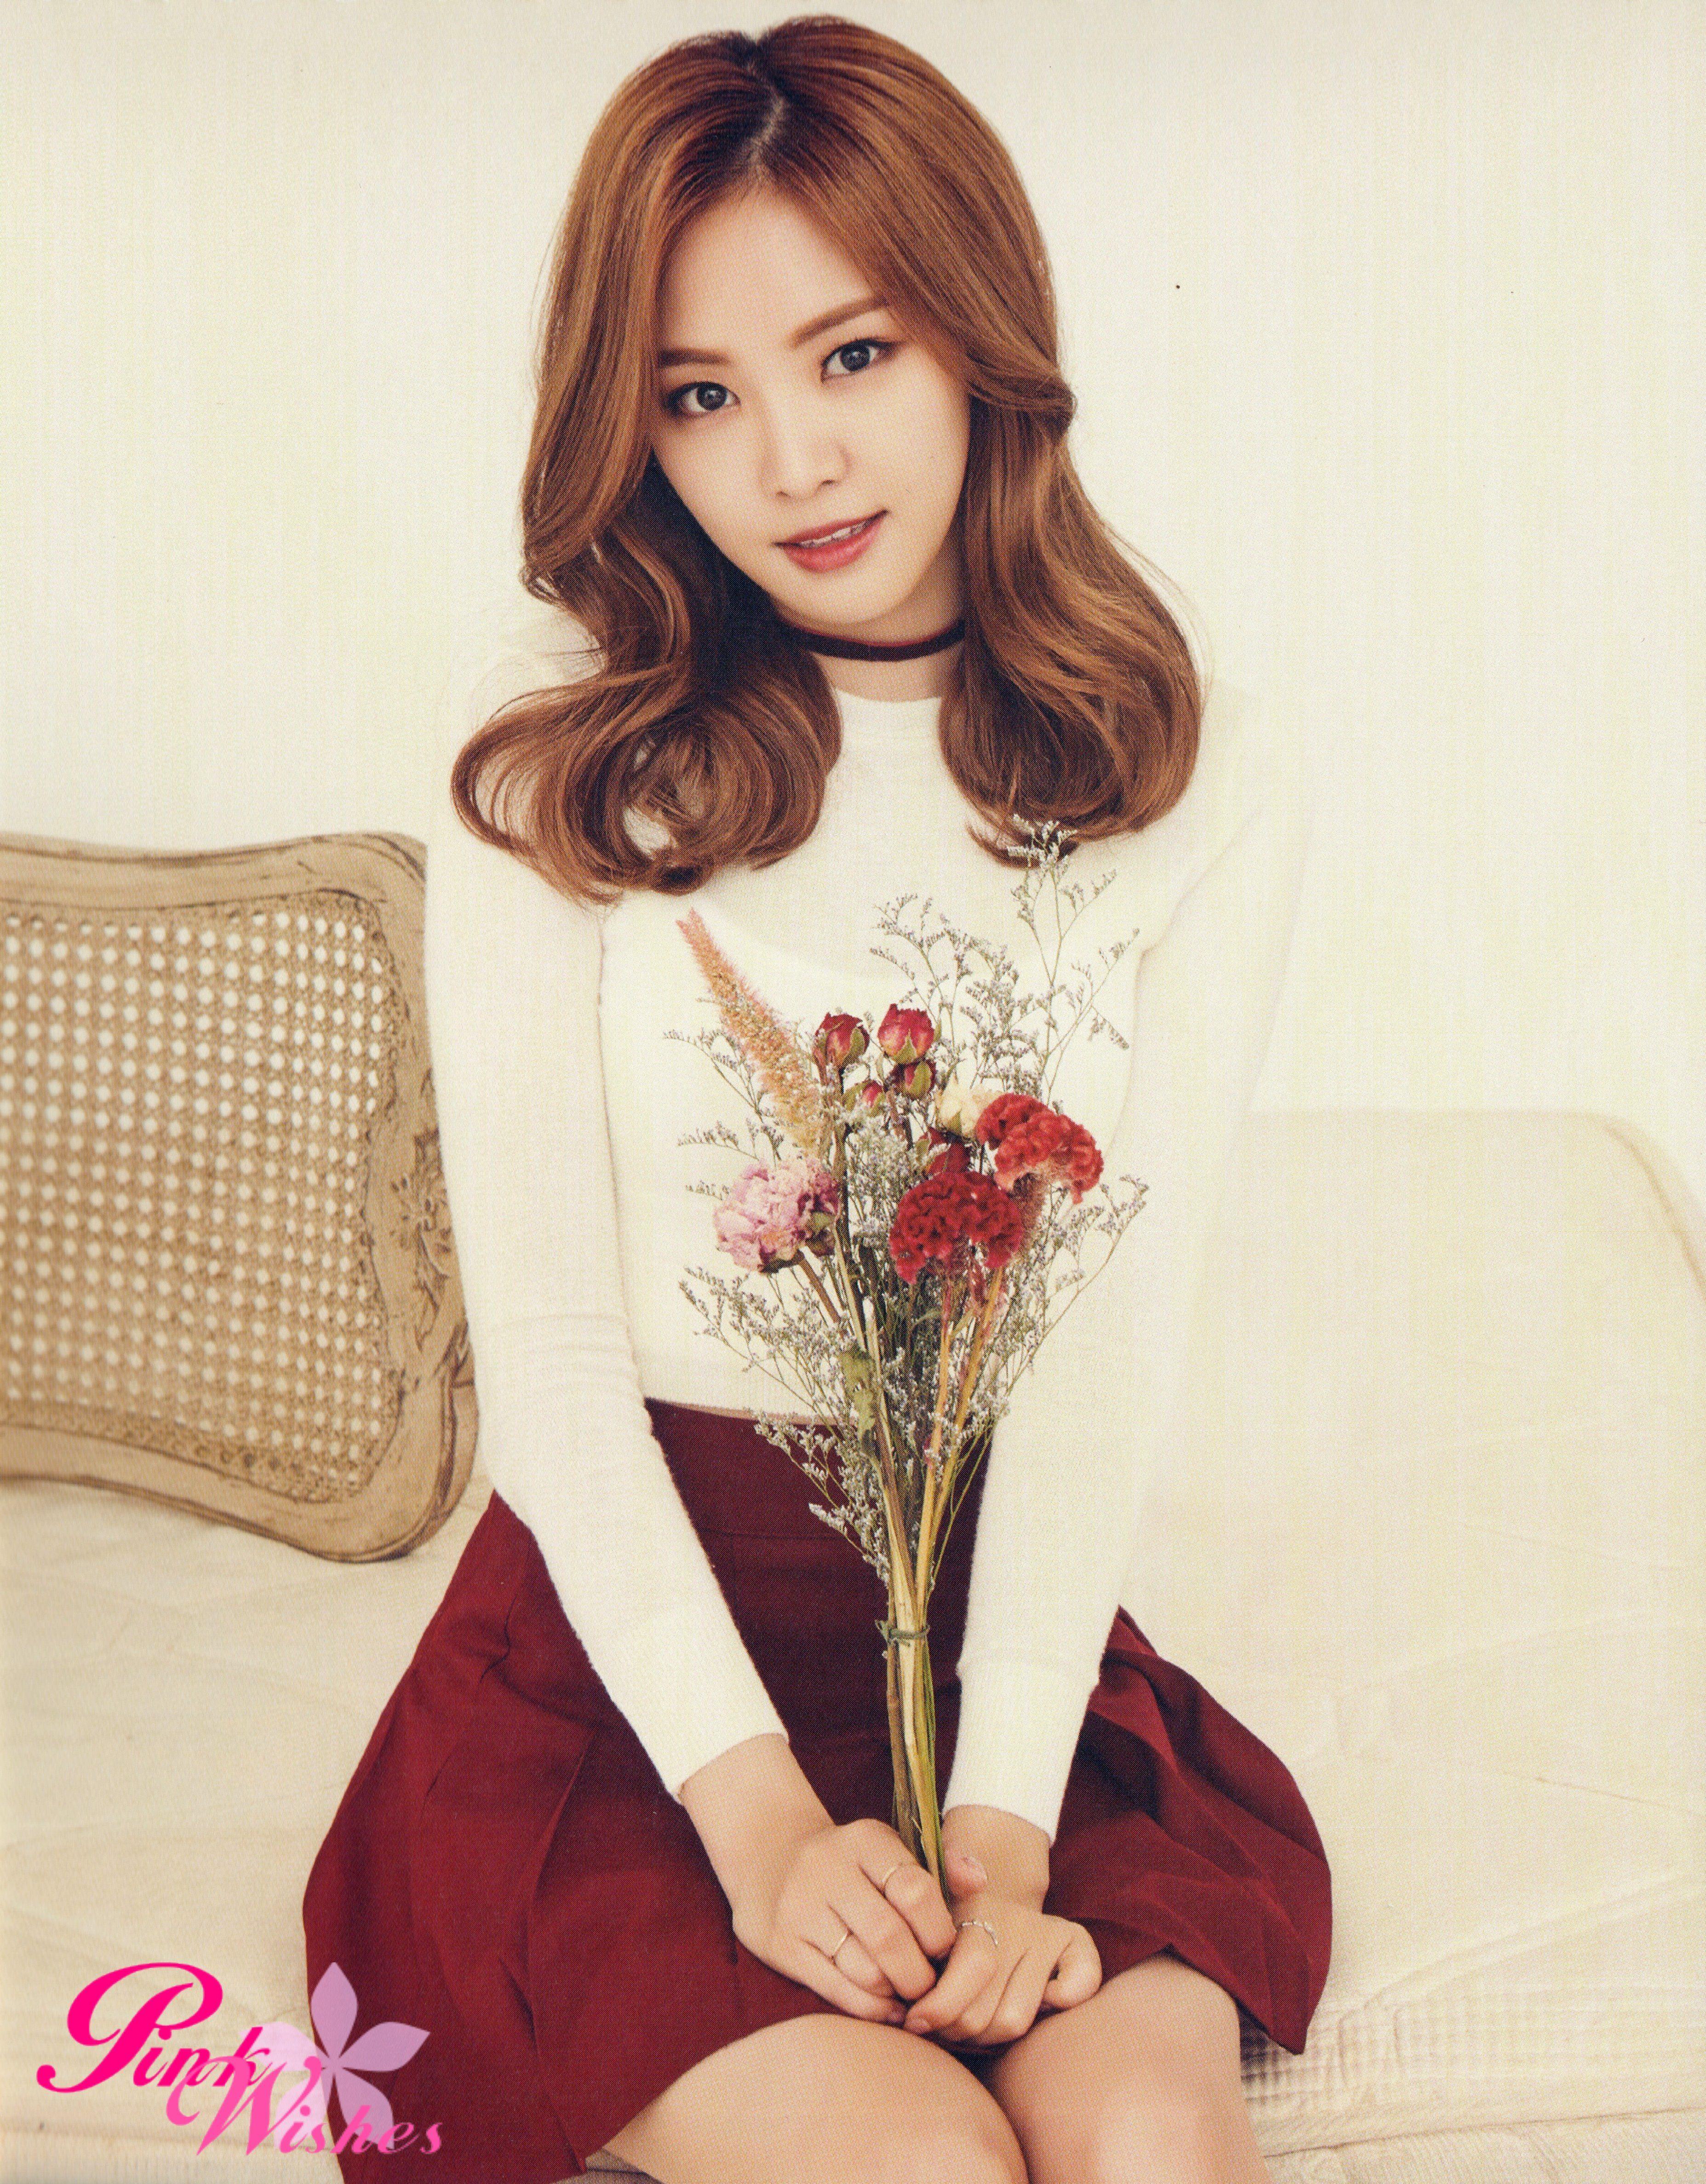 Apink Naeun Born In South Korea In 1994 Fashion Kpop Hair Ideas Kpop Idols Coreanos Moda